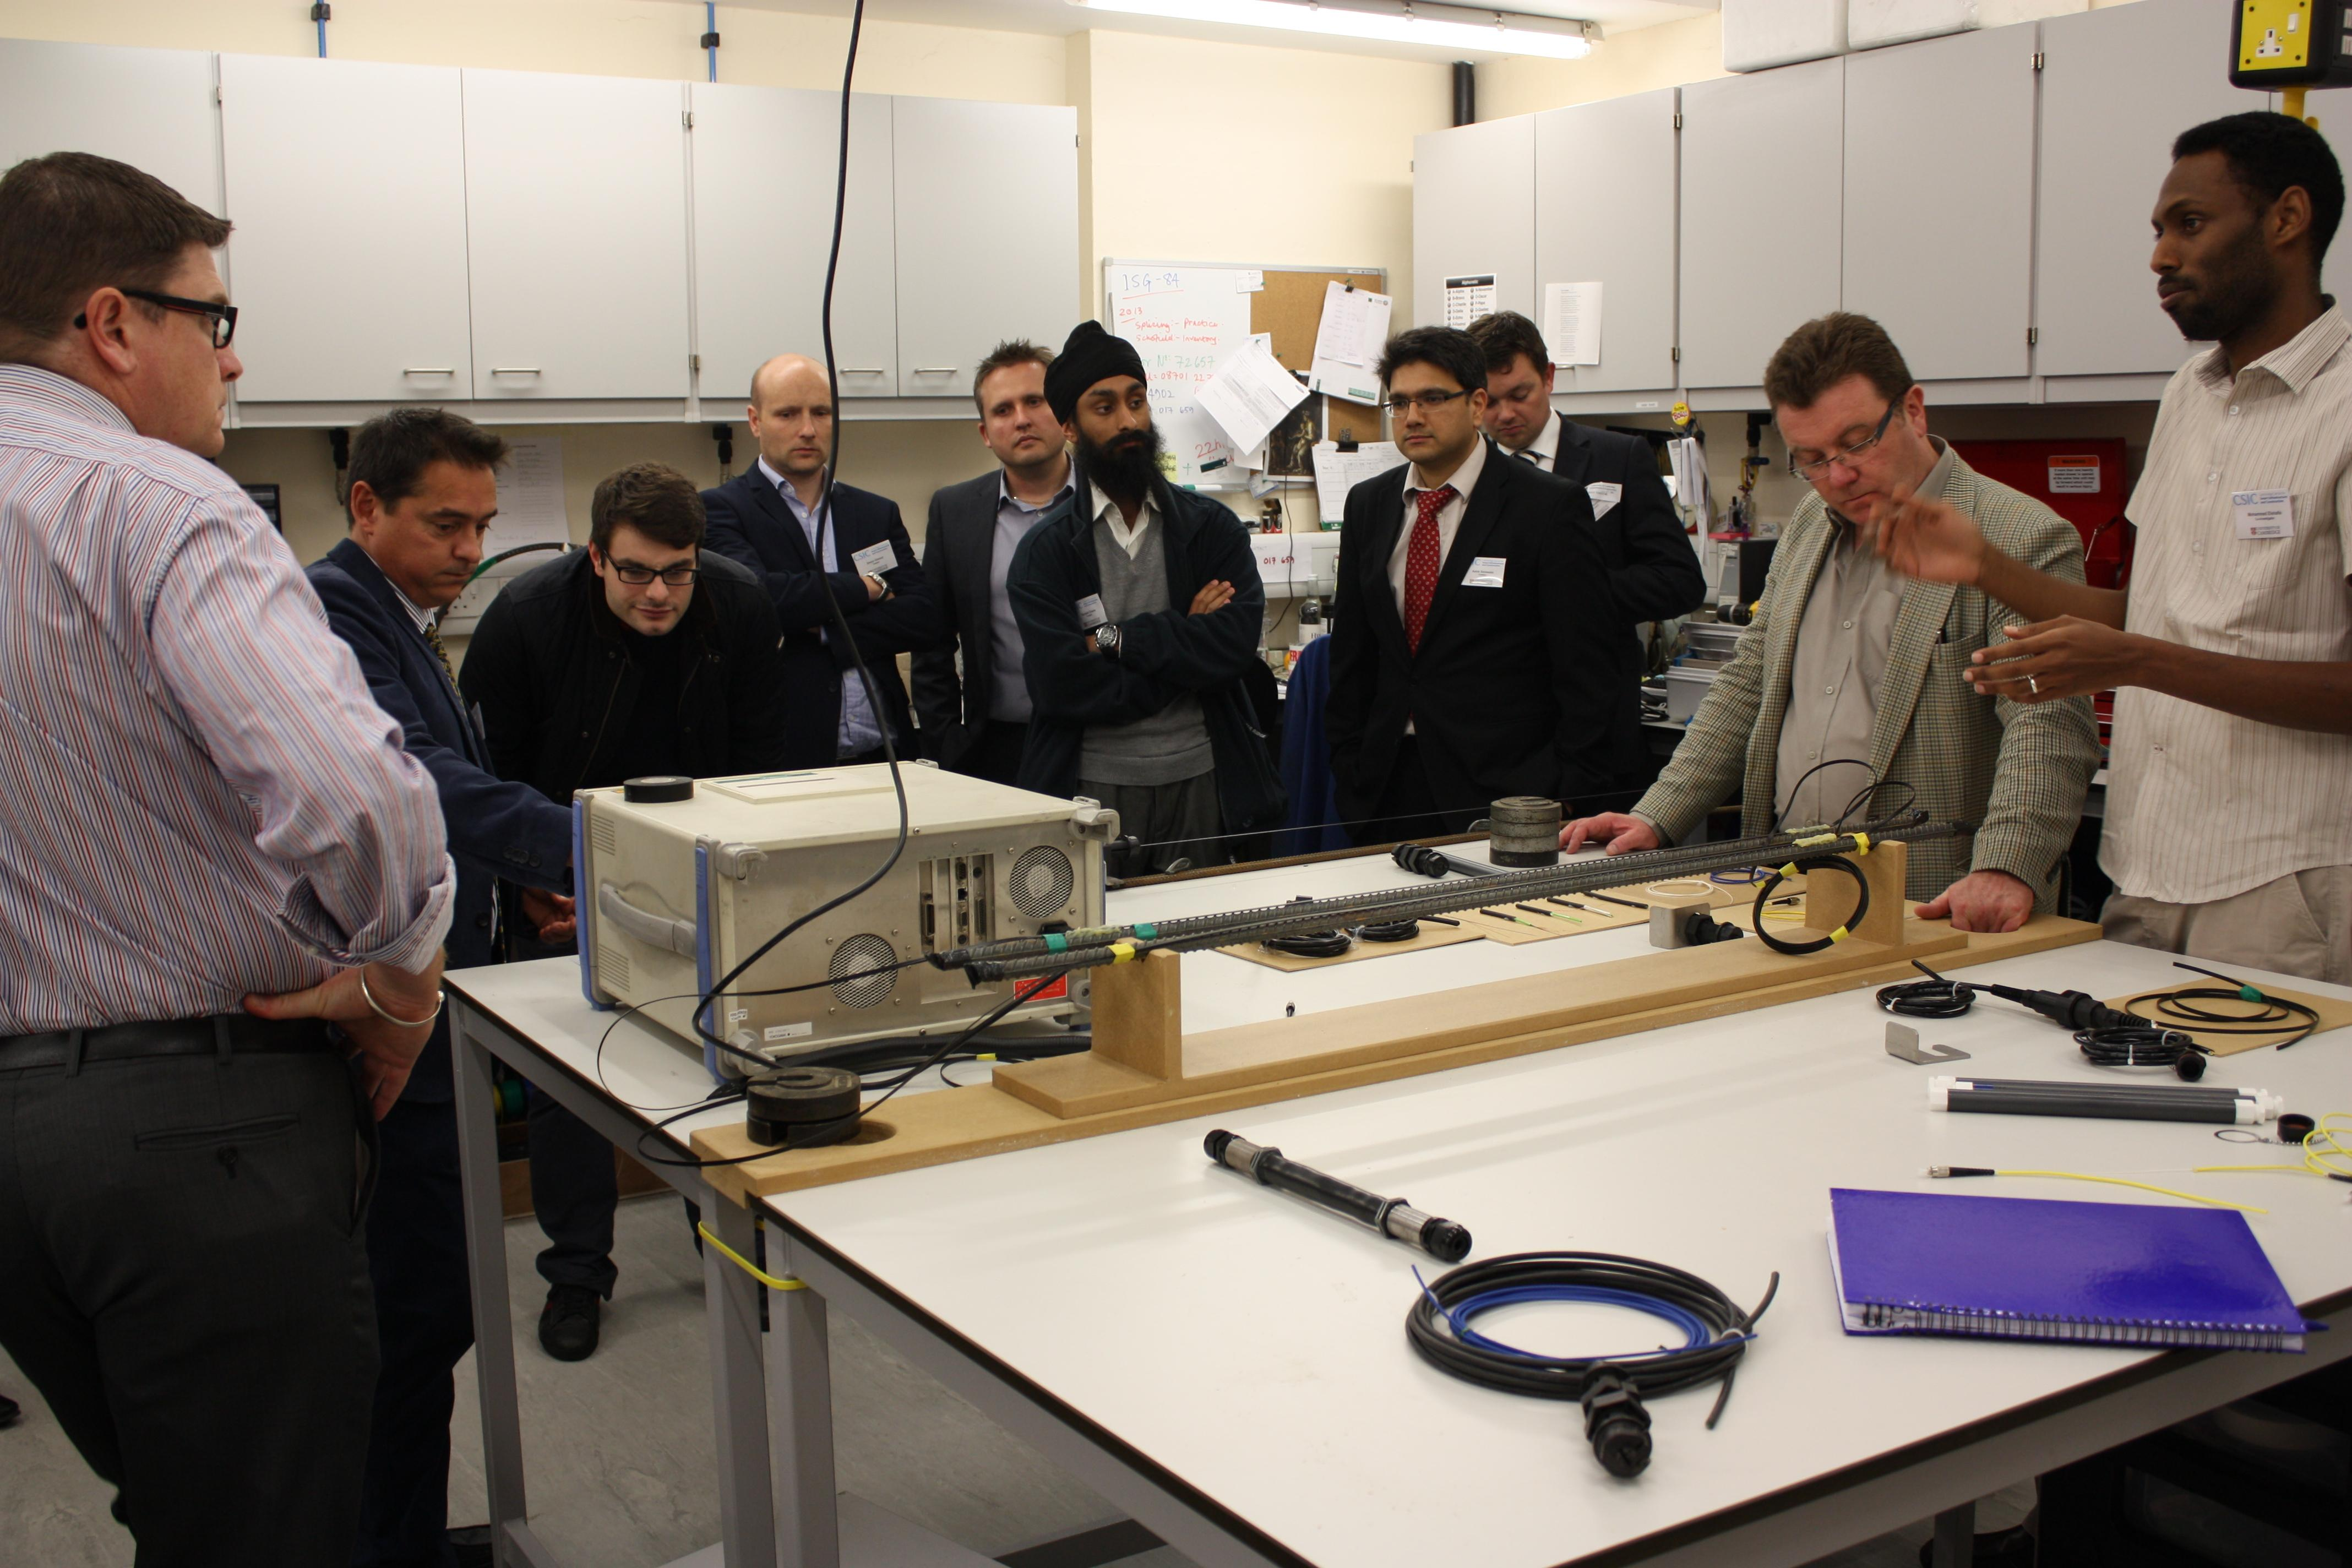 CSIC delivers unique course on distributed fibre optic sensing technology